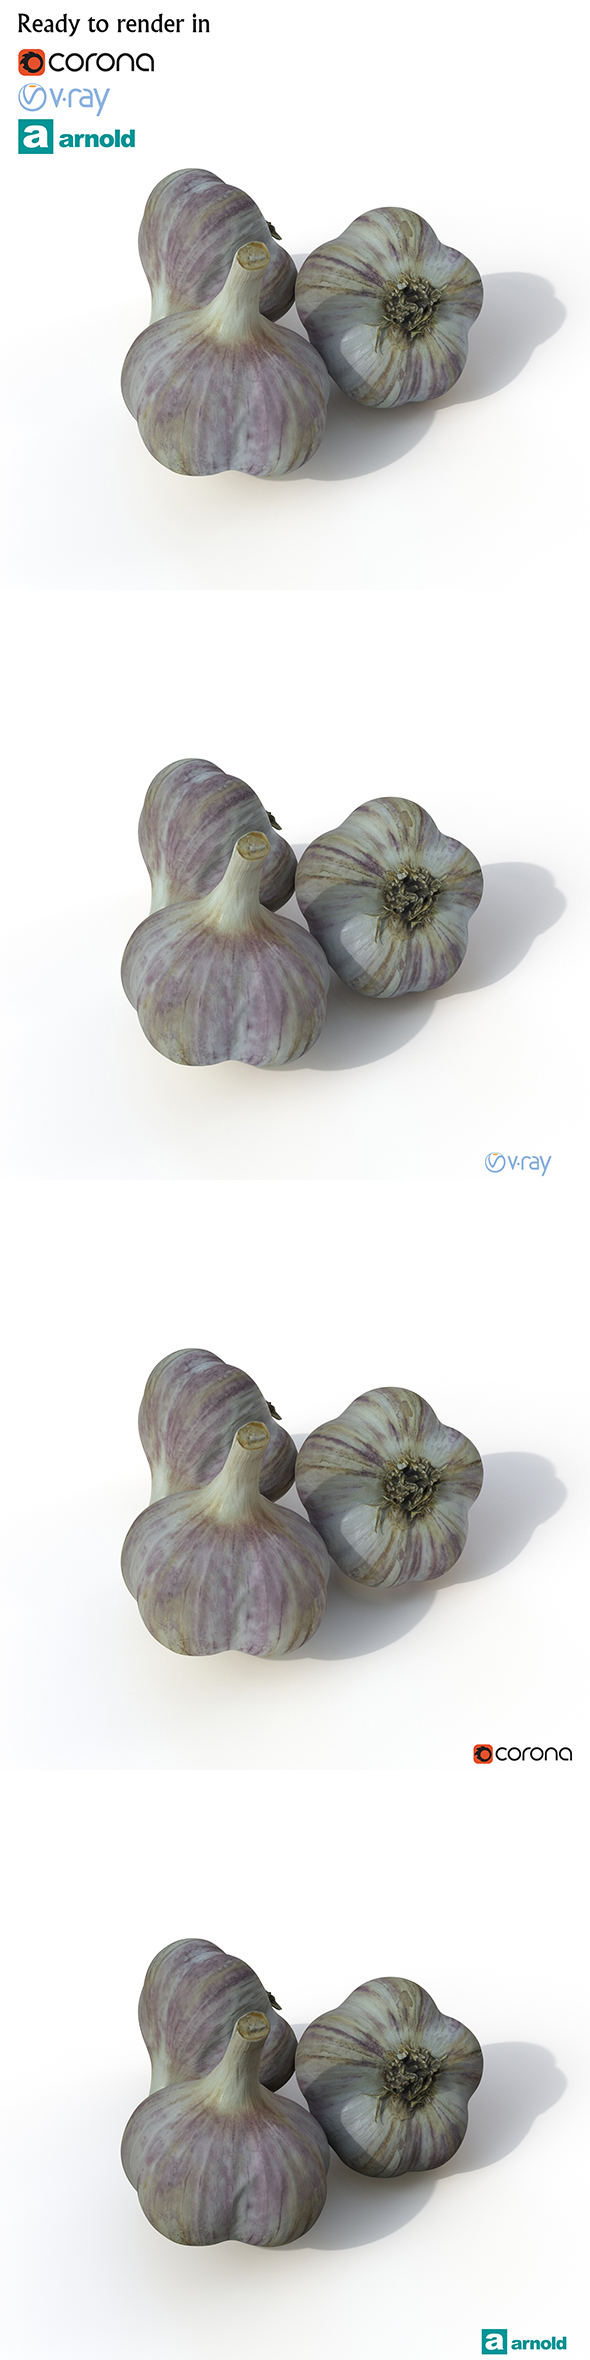 Garlic - 3DOcean Item for Sale